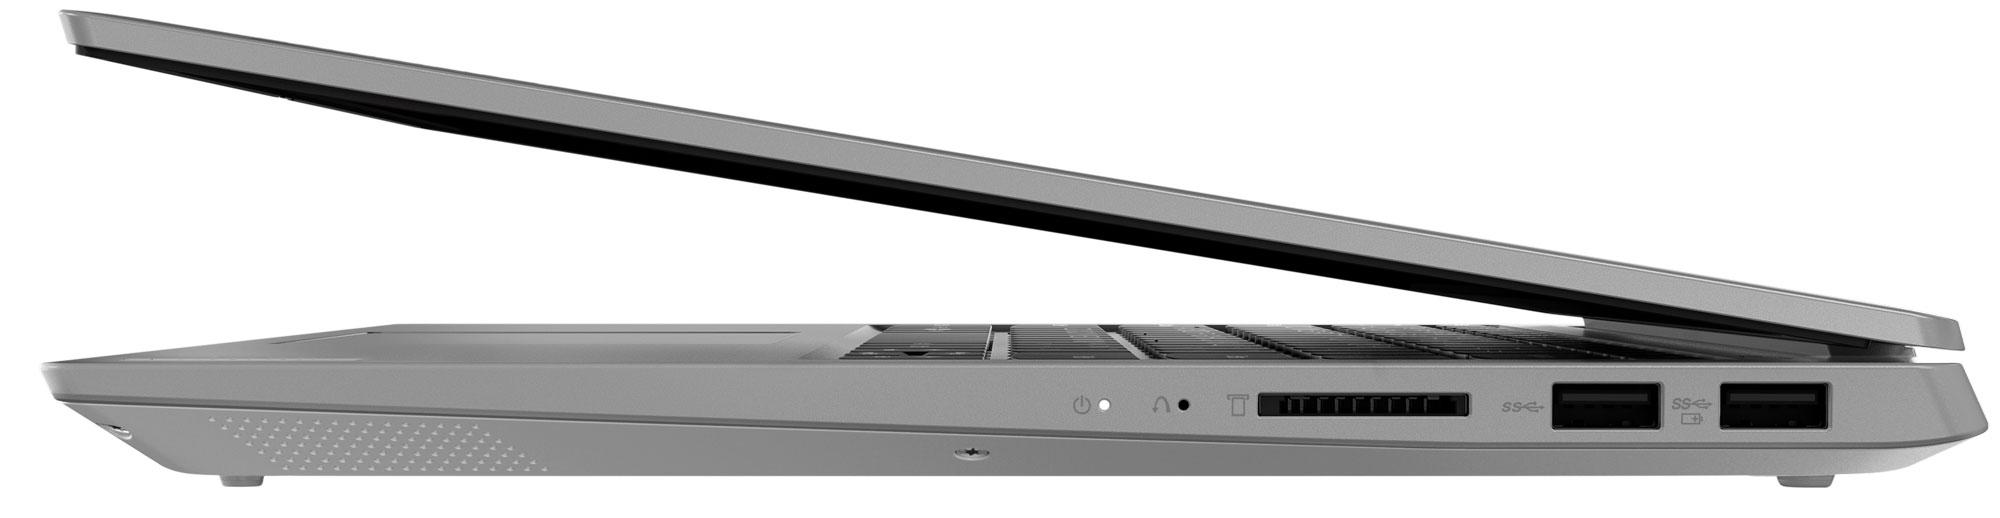 Фото  Ноутбук Lenovo ideapad S340-14IWL Platinum Grey (81N700RERE)